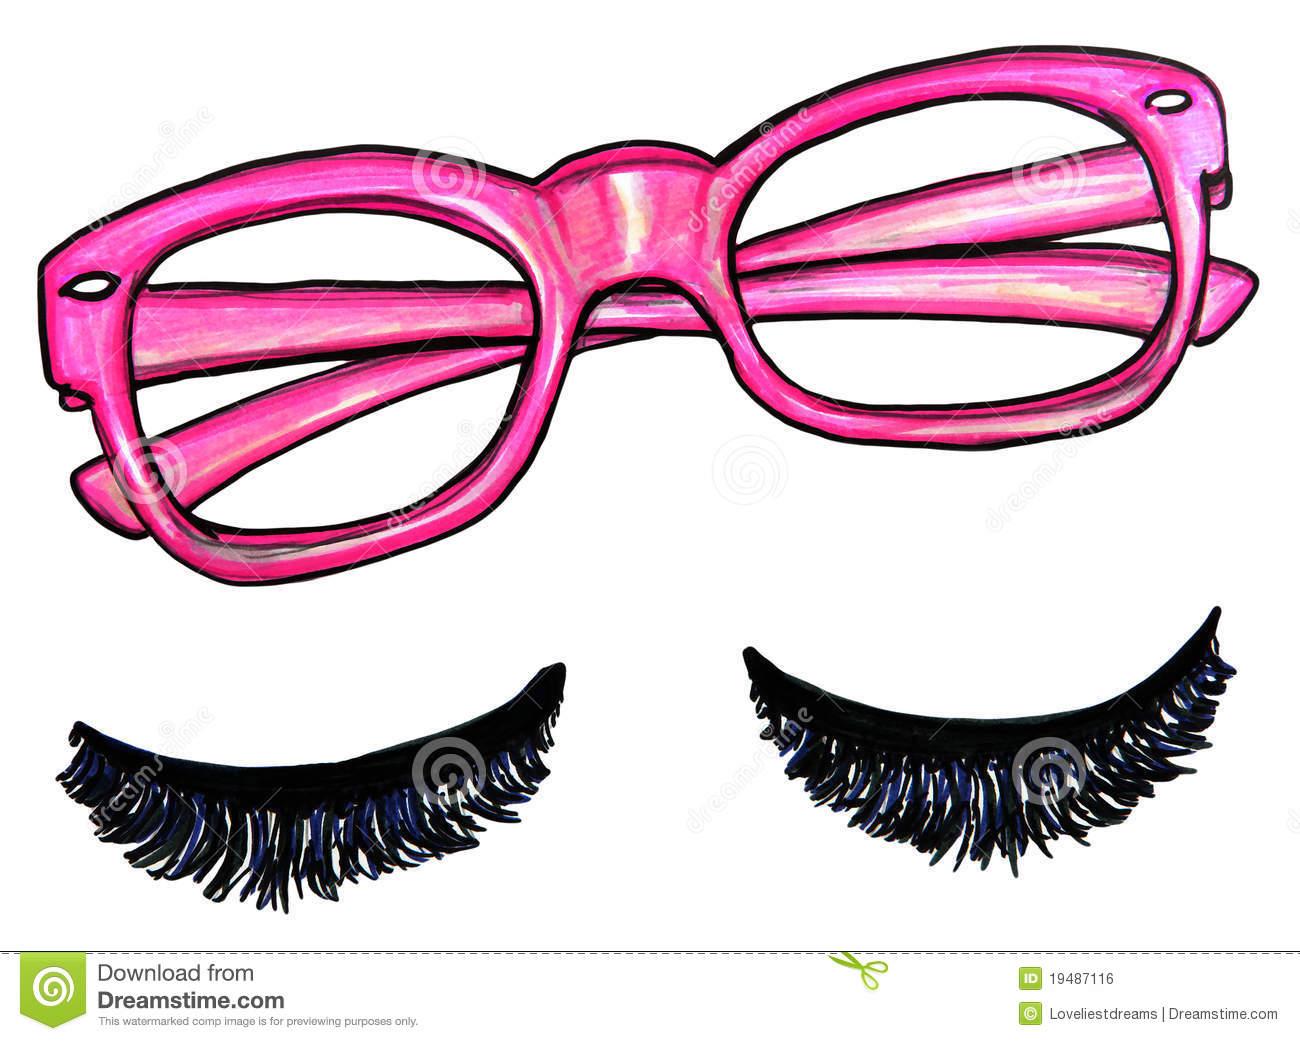 Eyelash clipart pink Images Clipart Clipart Panda Free